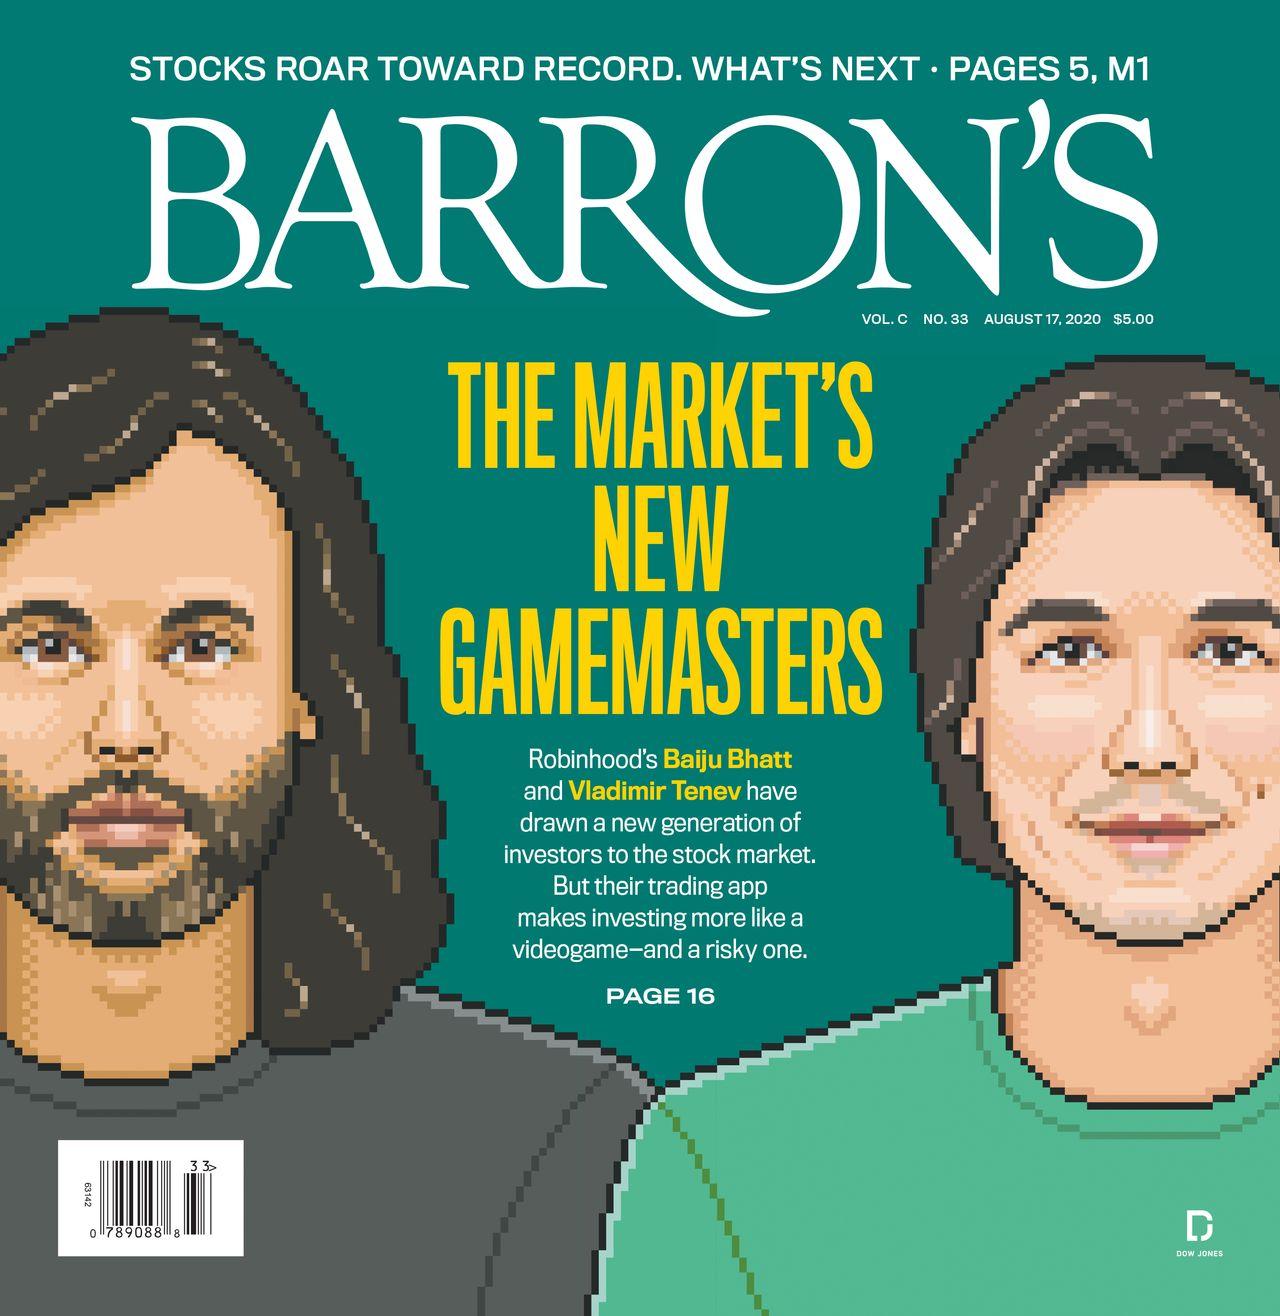 Cover Illustration for Barron's Magazine